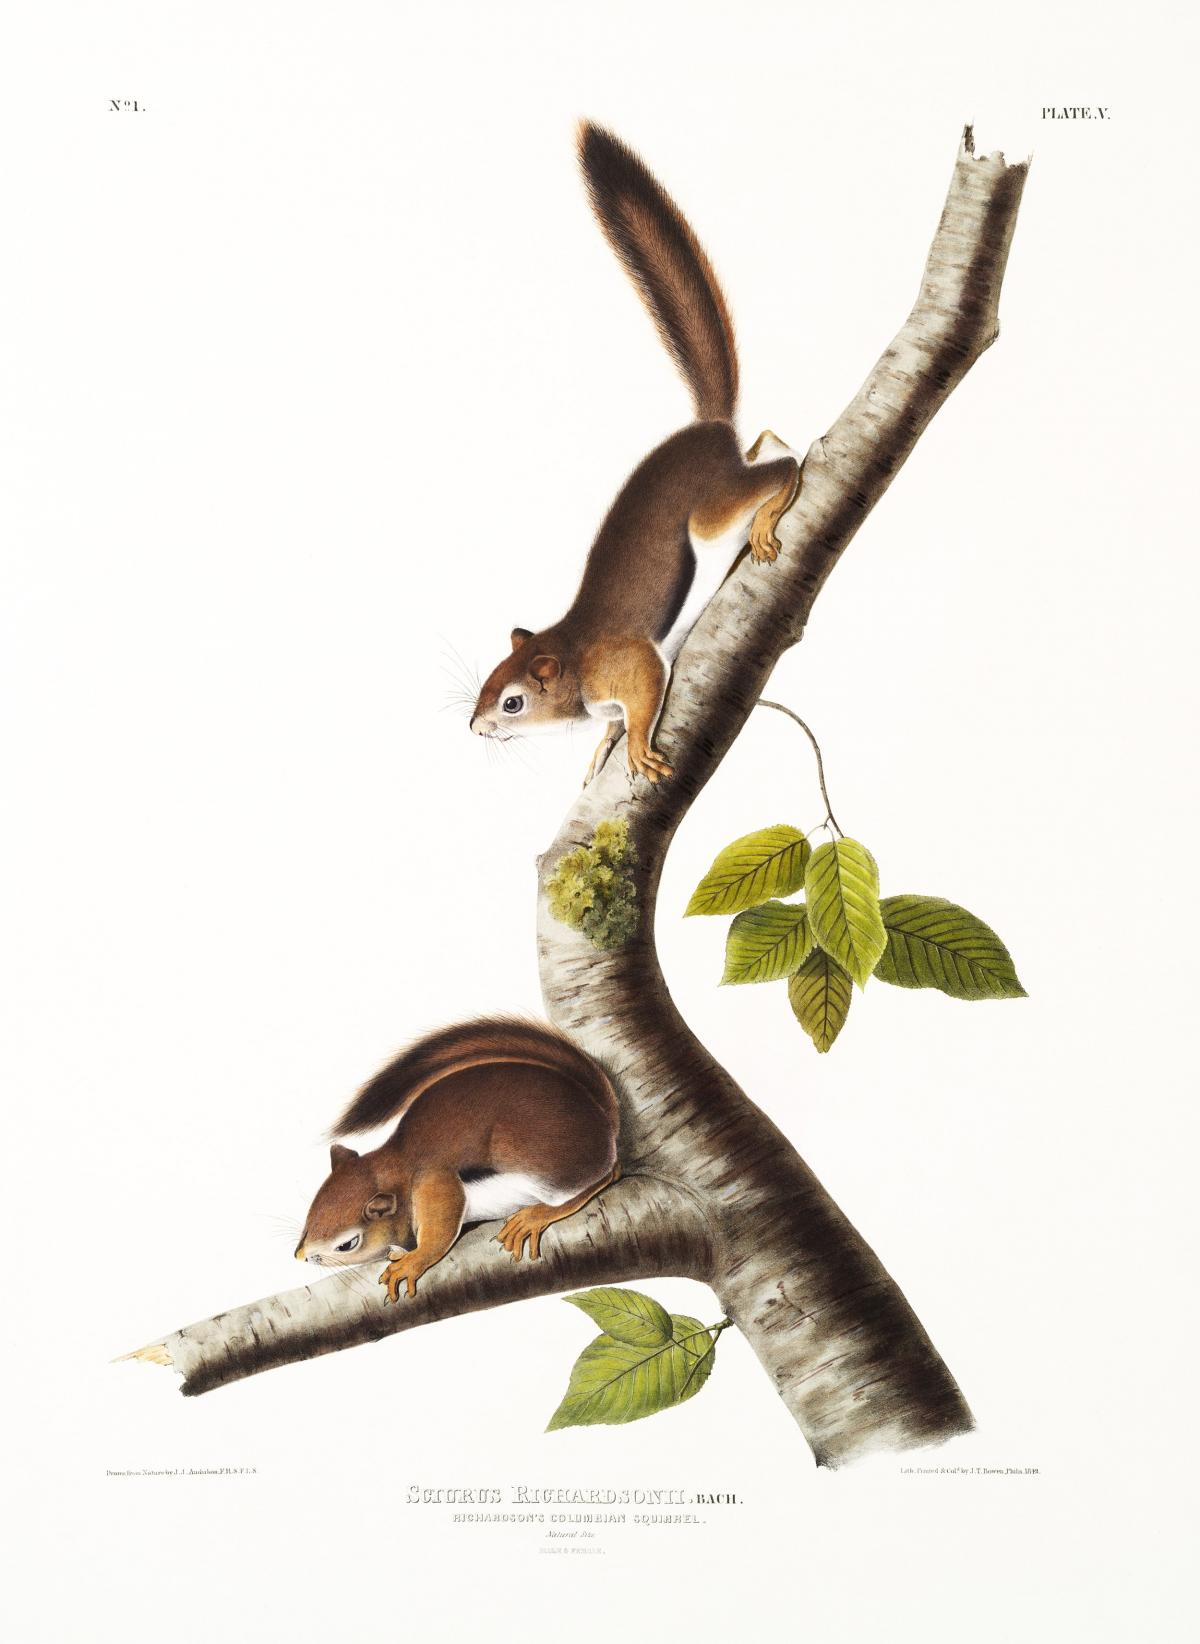 Richardson's Columbian Squirrel (Sciurus Richardsonii) from the viviparous quadrupeds of North America (1845) illustrated by John Woodhouse Audubon (1812-1862). Original from The New York Public Library.